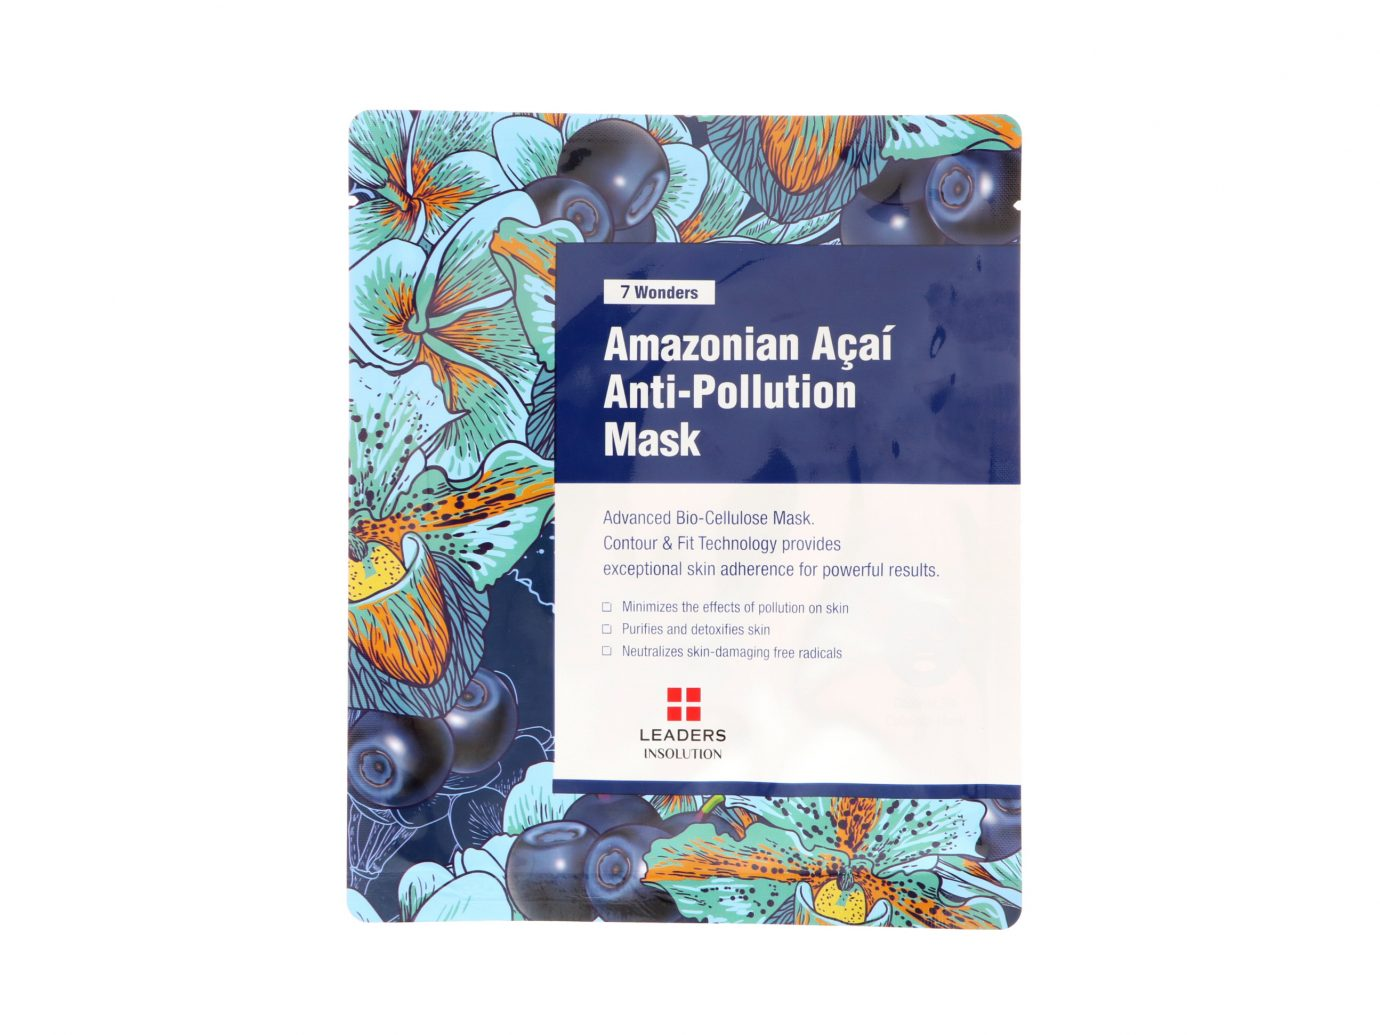 Leaders Cosmetics 7 Wonders Amazonian Acai Anti-Pollution Mask